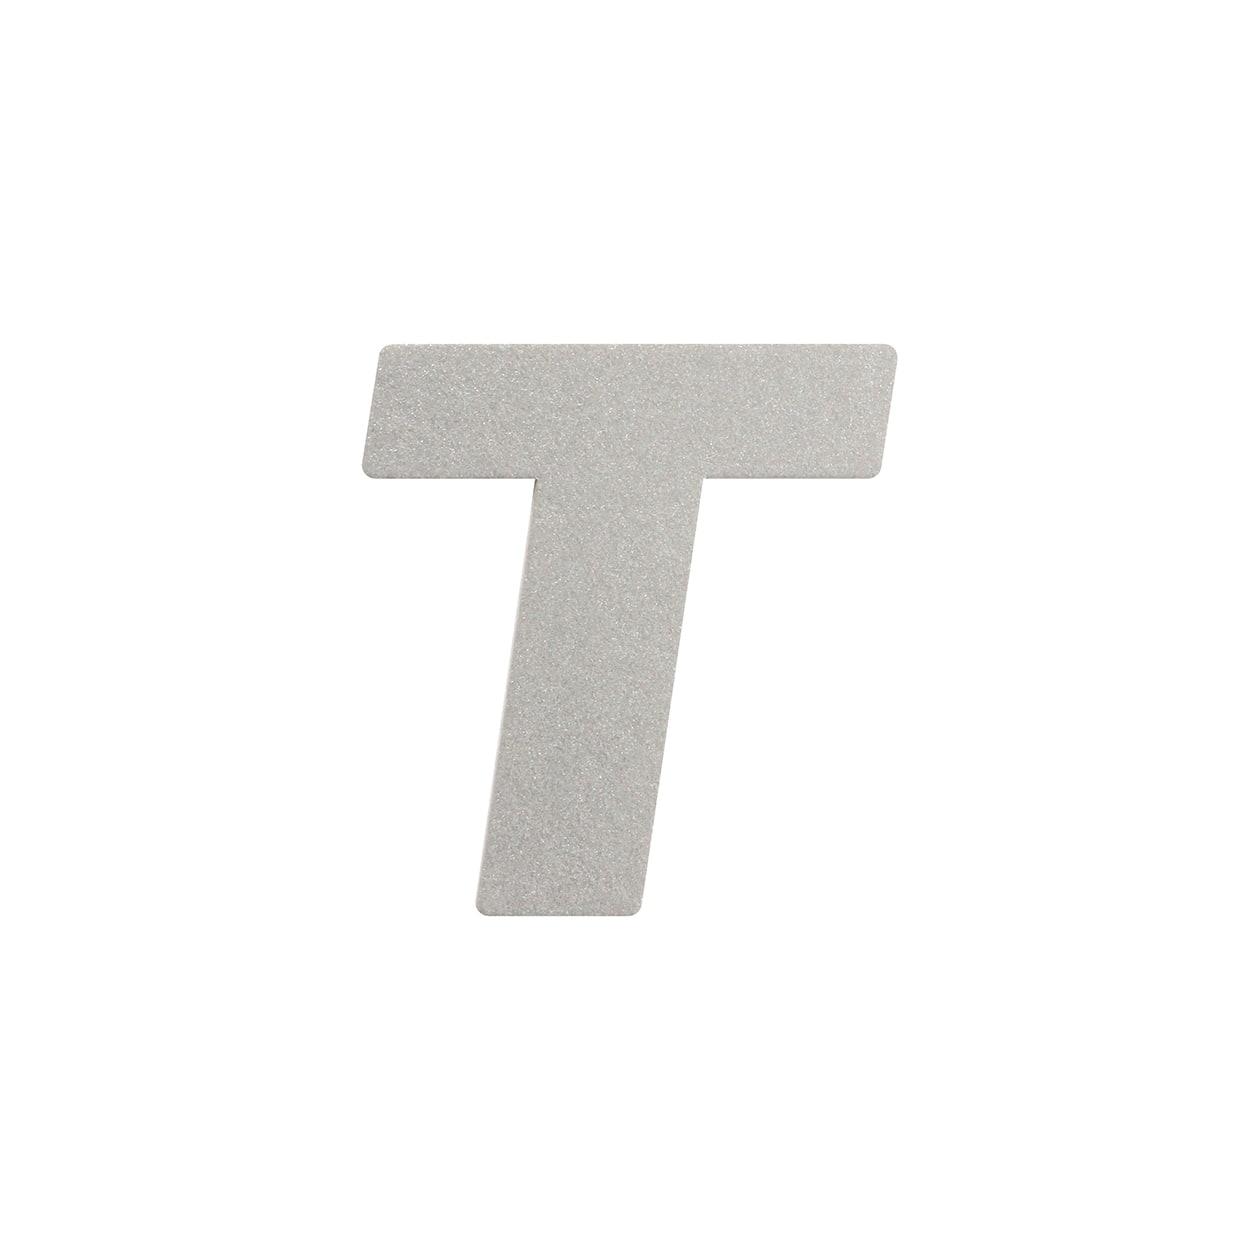 No.395ボード A7カードDC 文字T シルバー